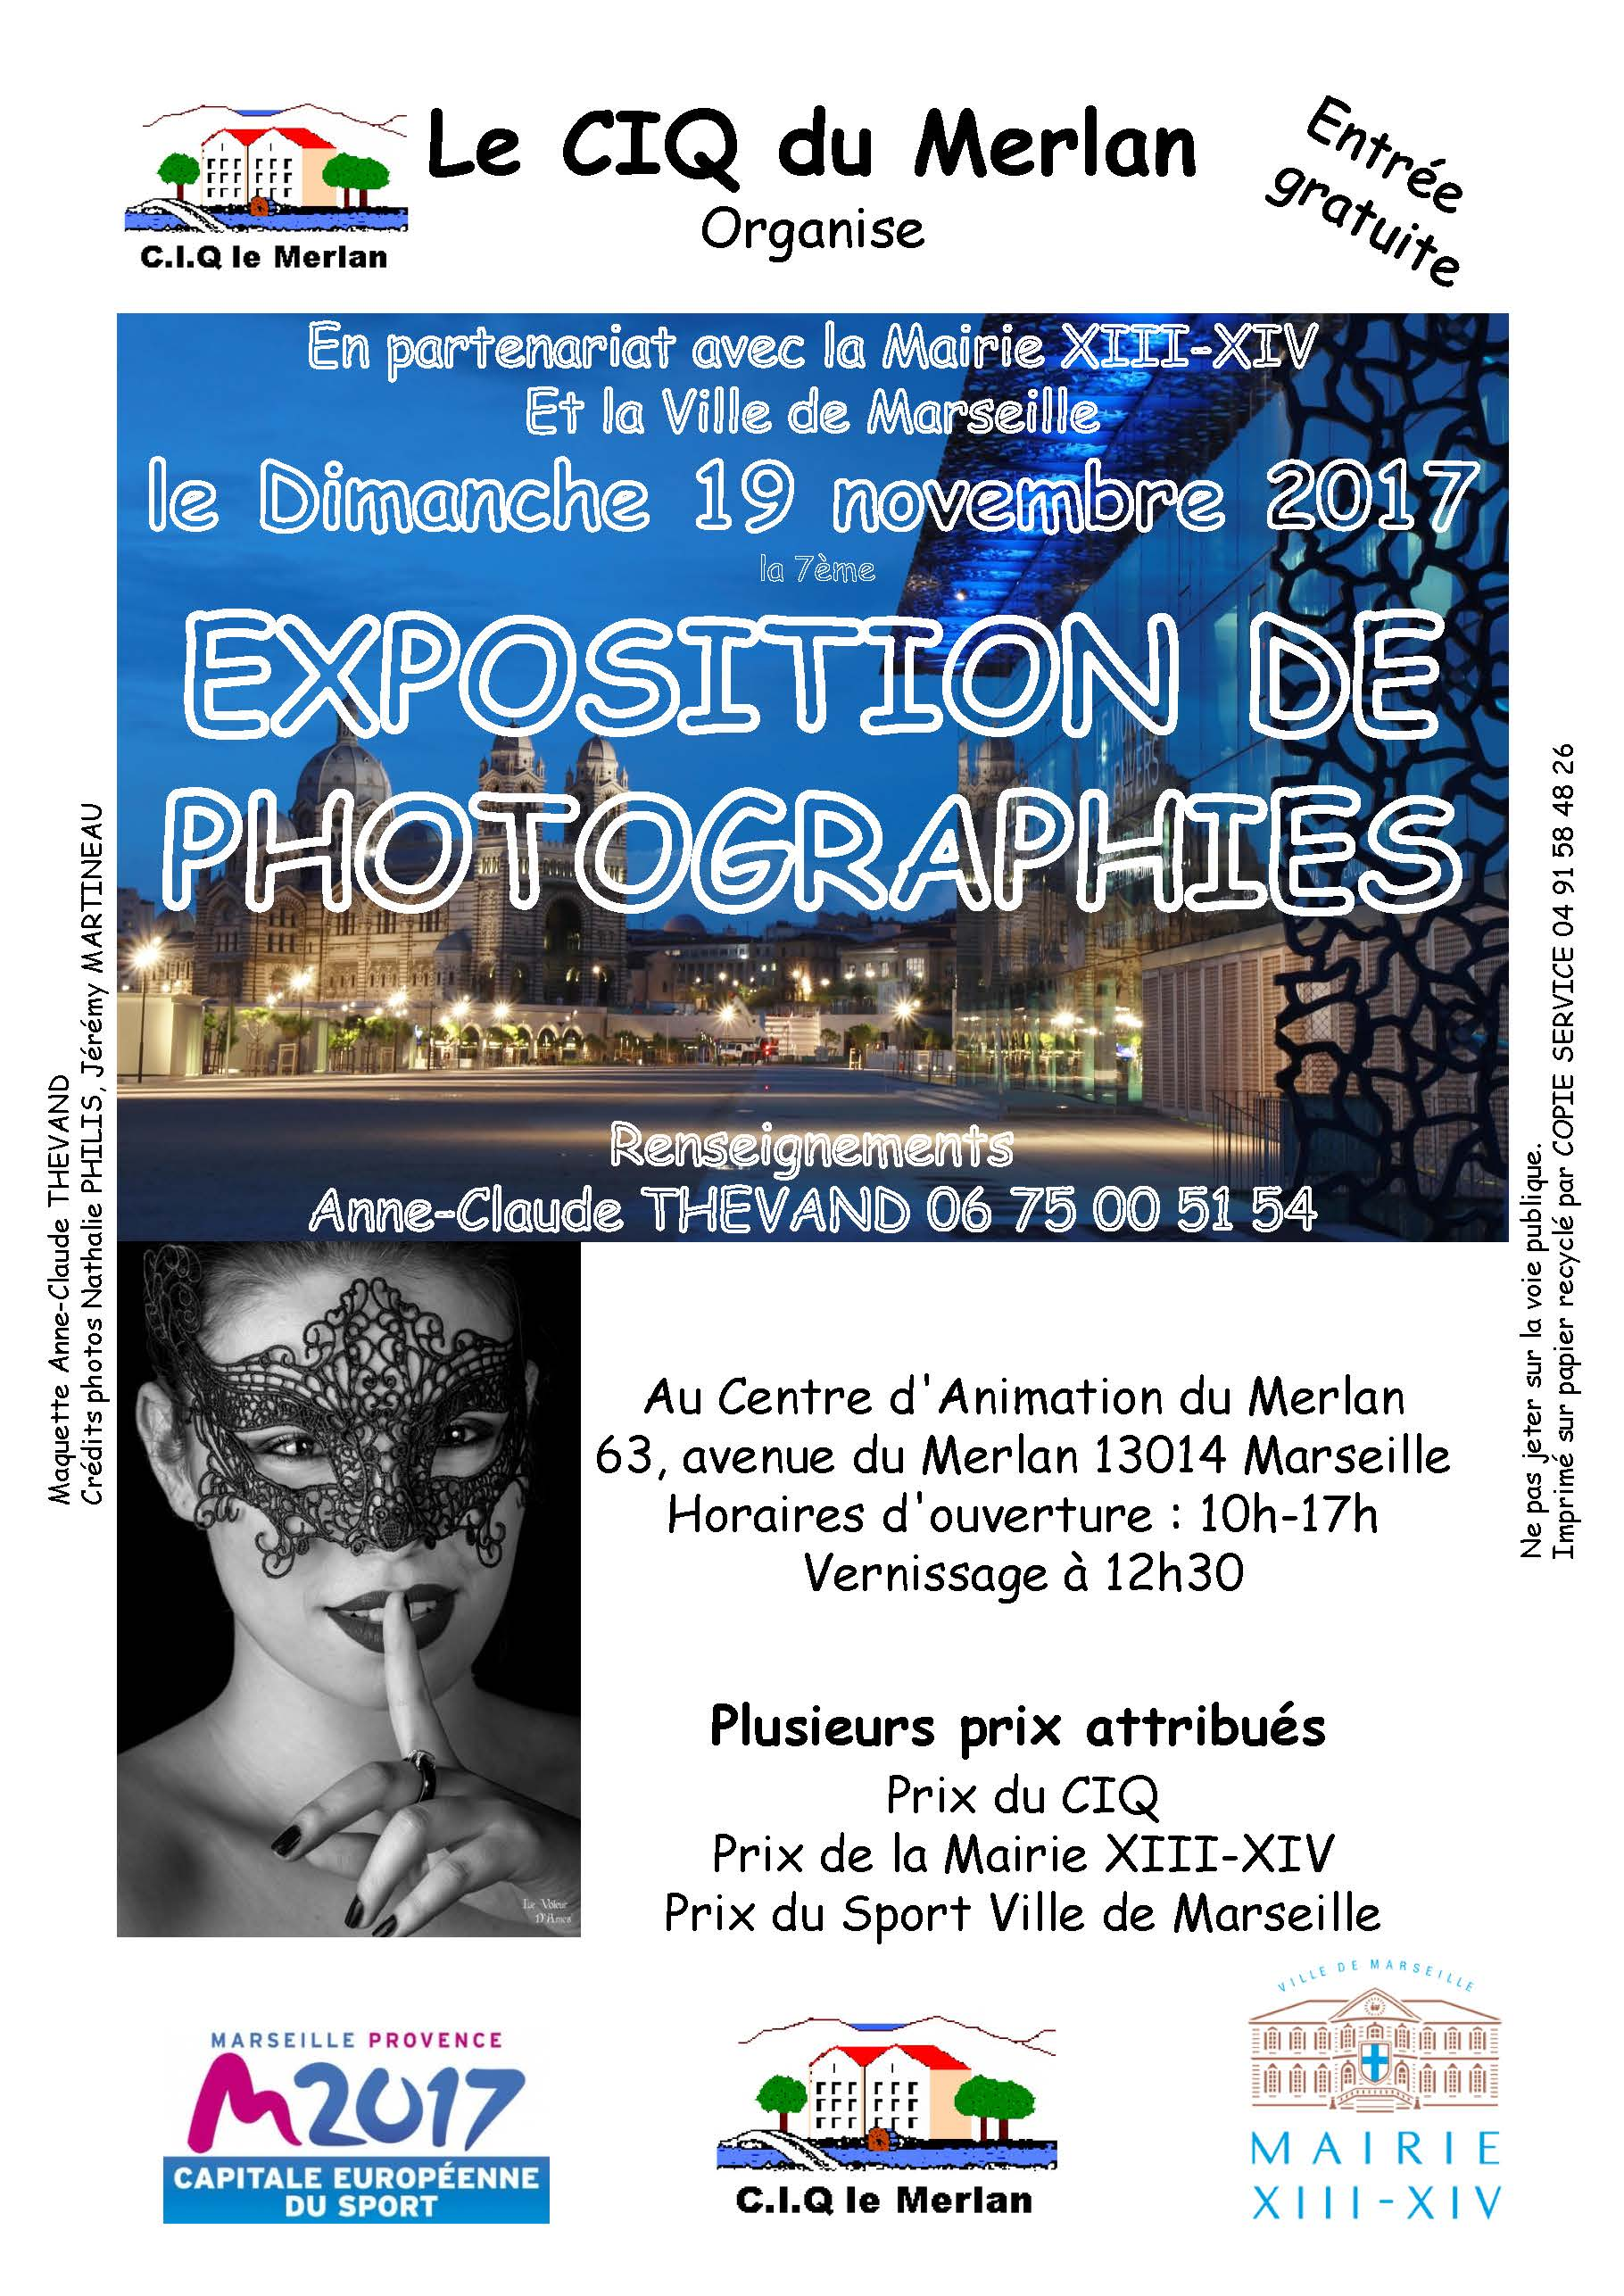 Expo photo Merlan 2017